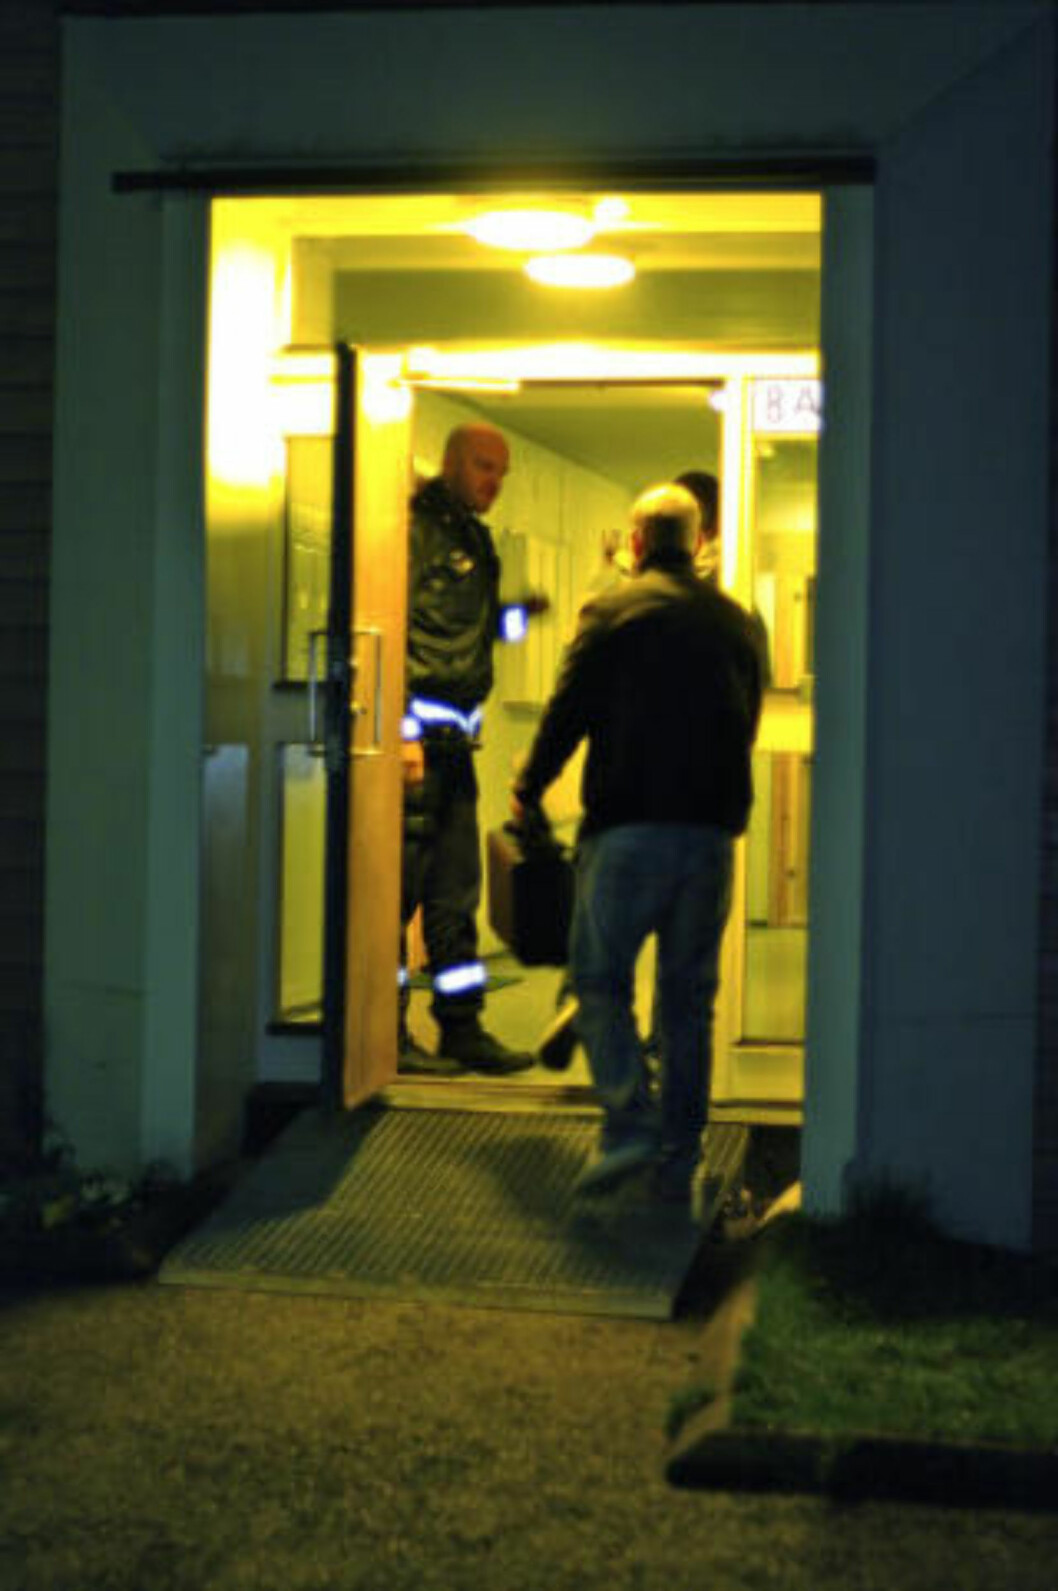 <strong>ETTERFORSKERE:</strong> Etterforskere fra kriminalvakta i Oslo er på stedet. Foto: Tipser.no/Daniel D. Laabak